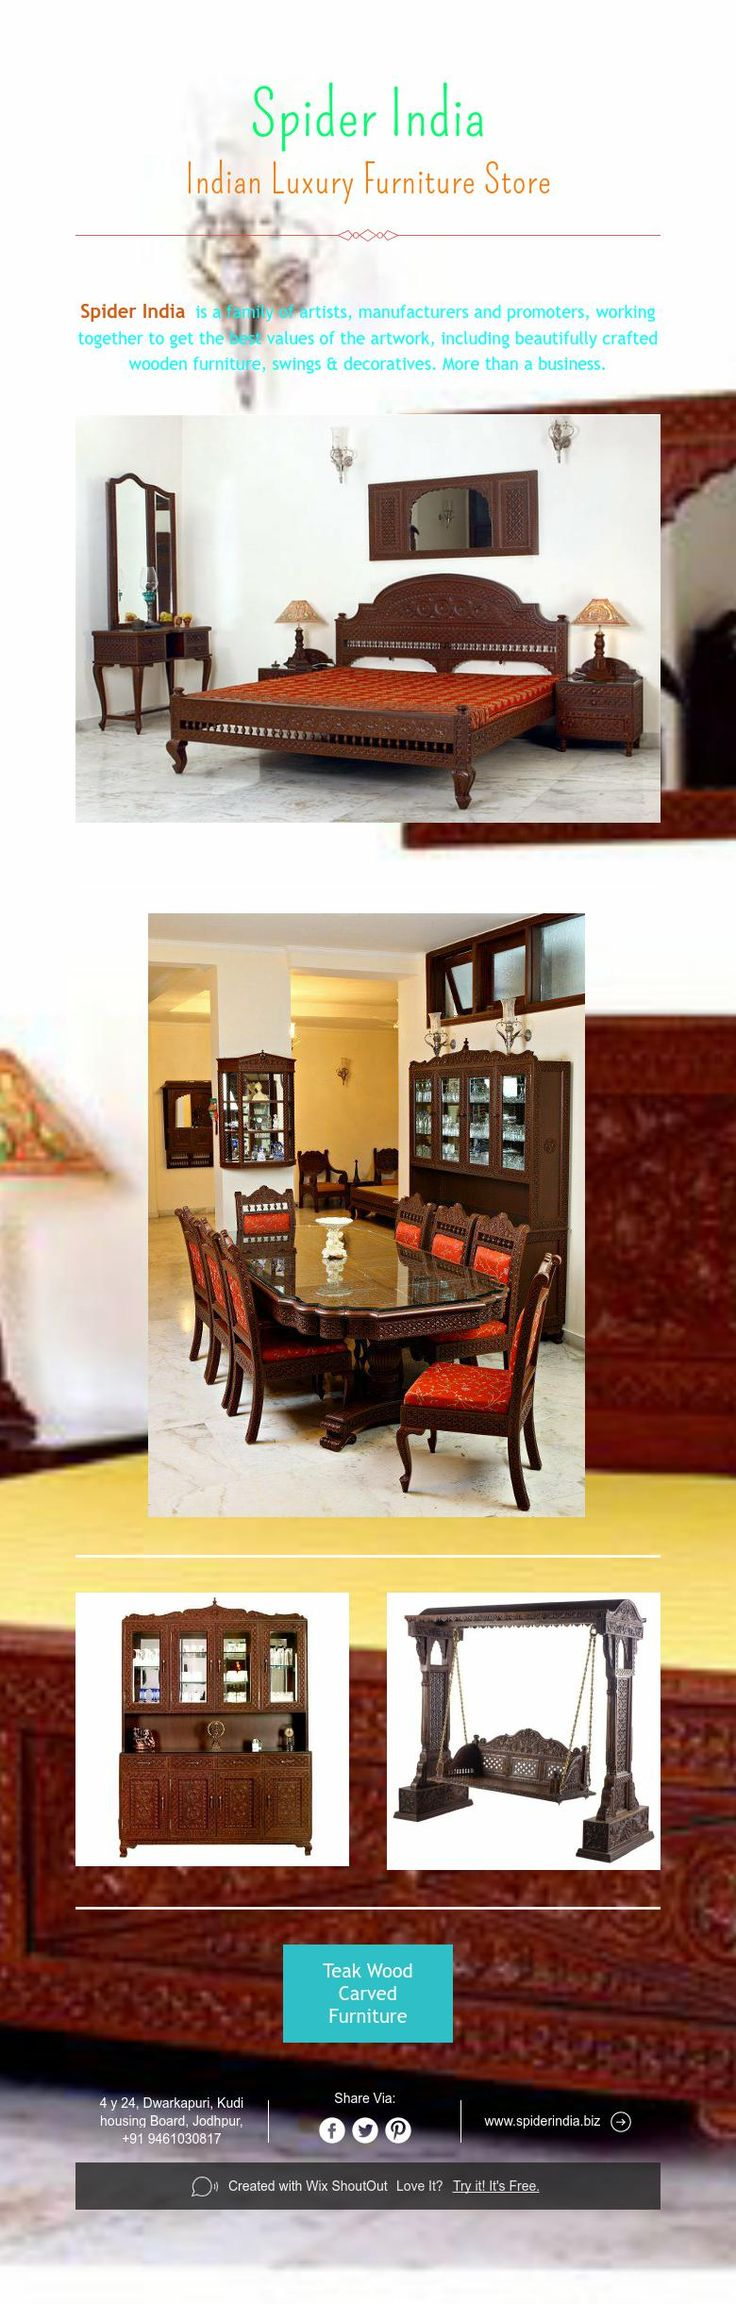 Spider India Indian Luxury Furniture Store